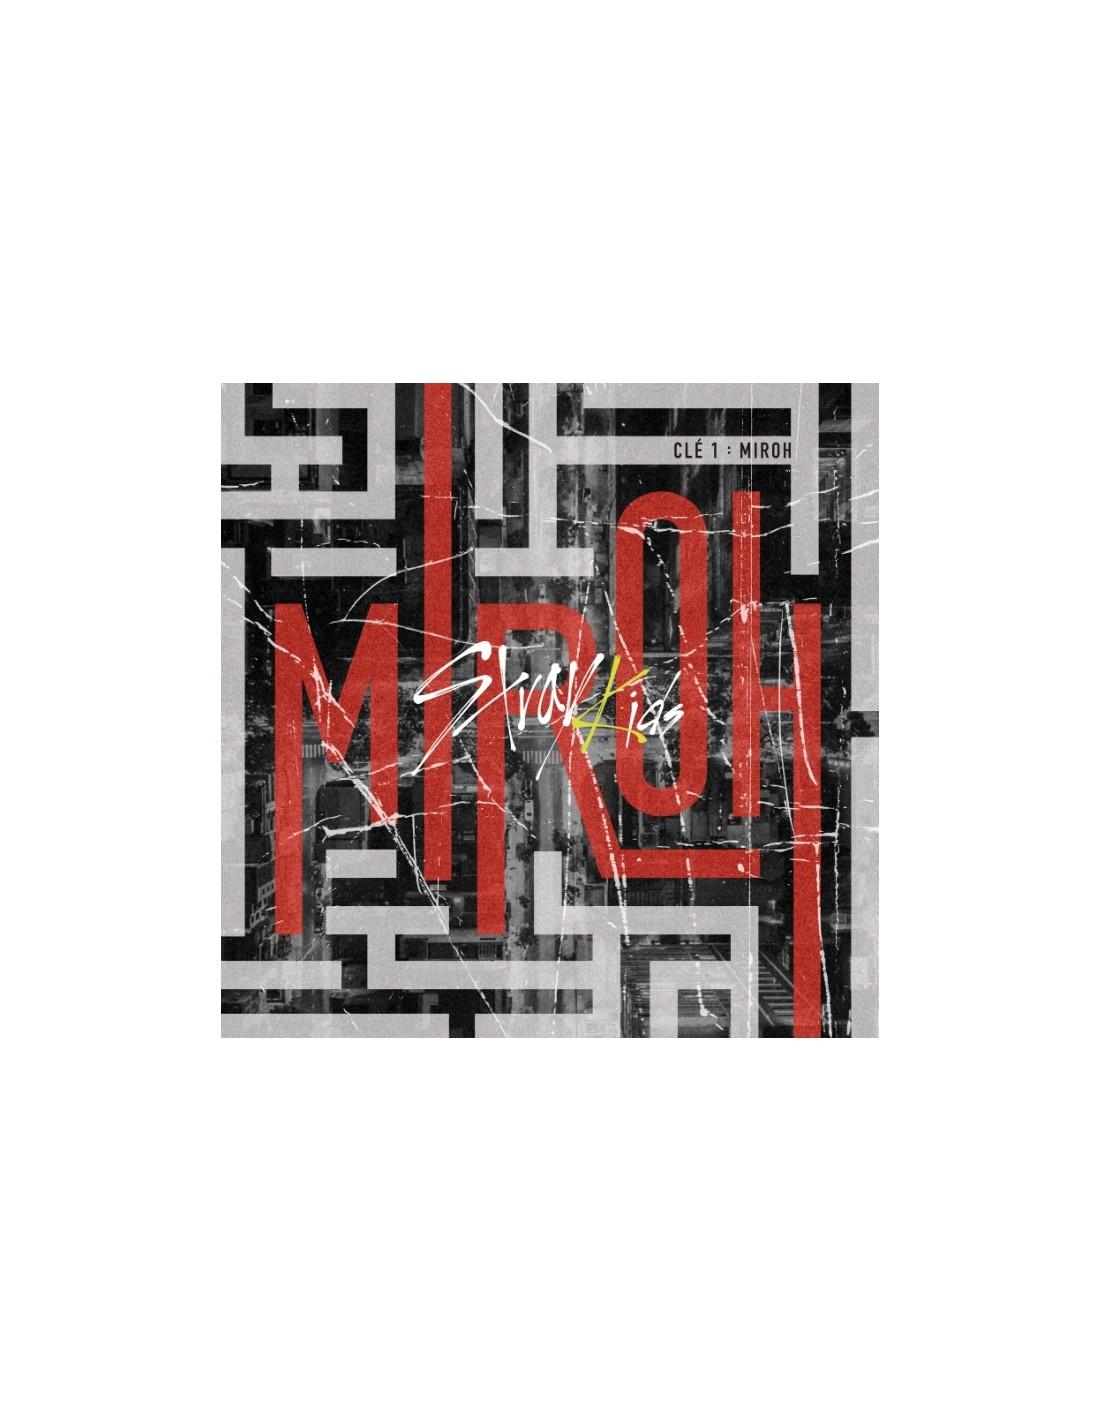 Stray Kids - Cle1 : MIROH (Random Ver) CD + Poster